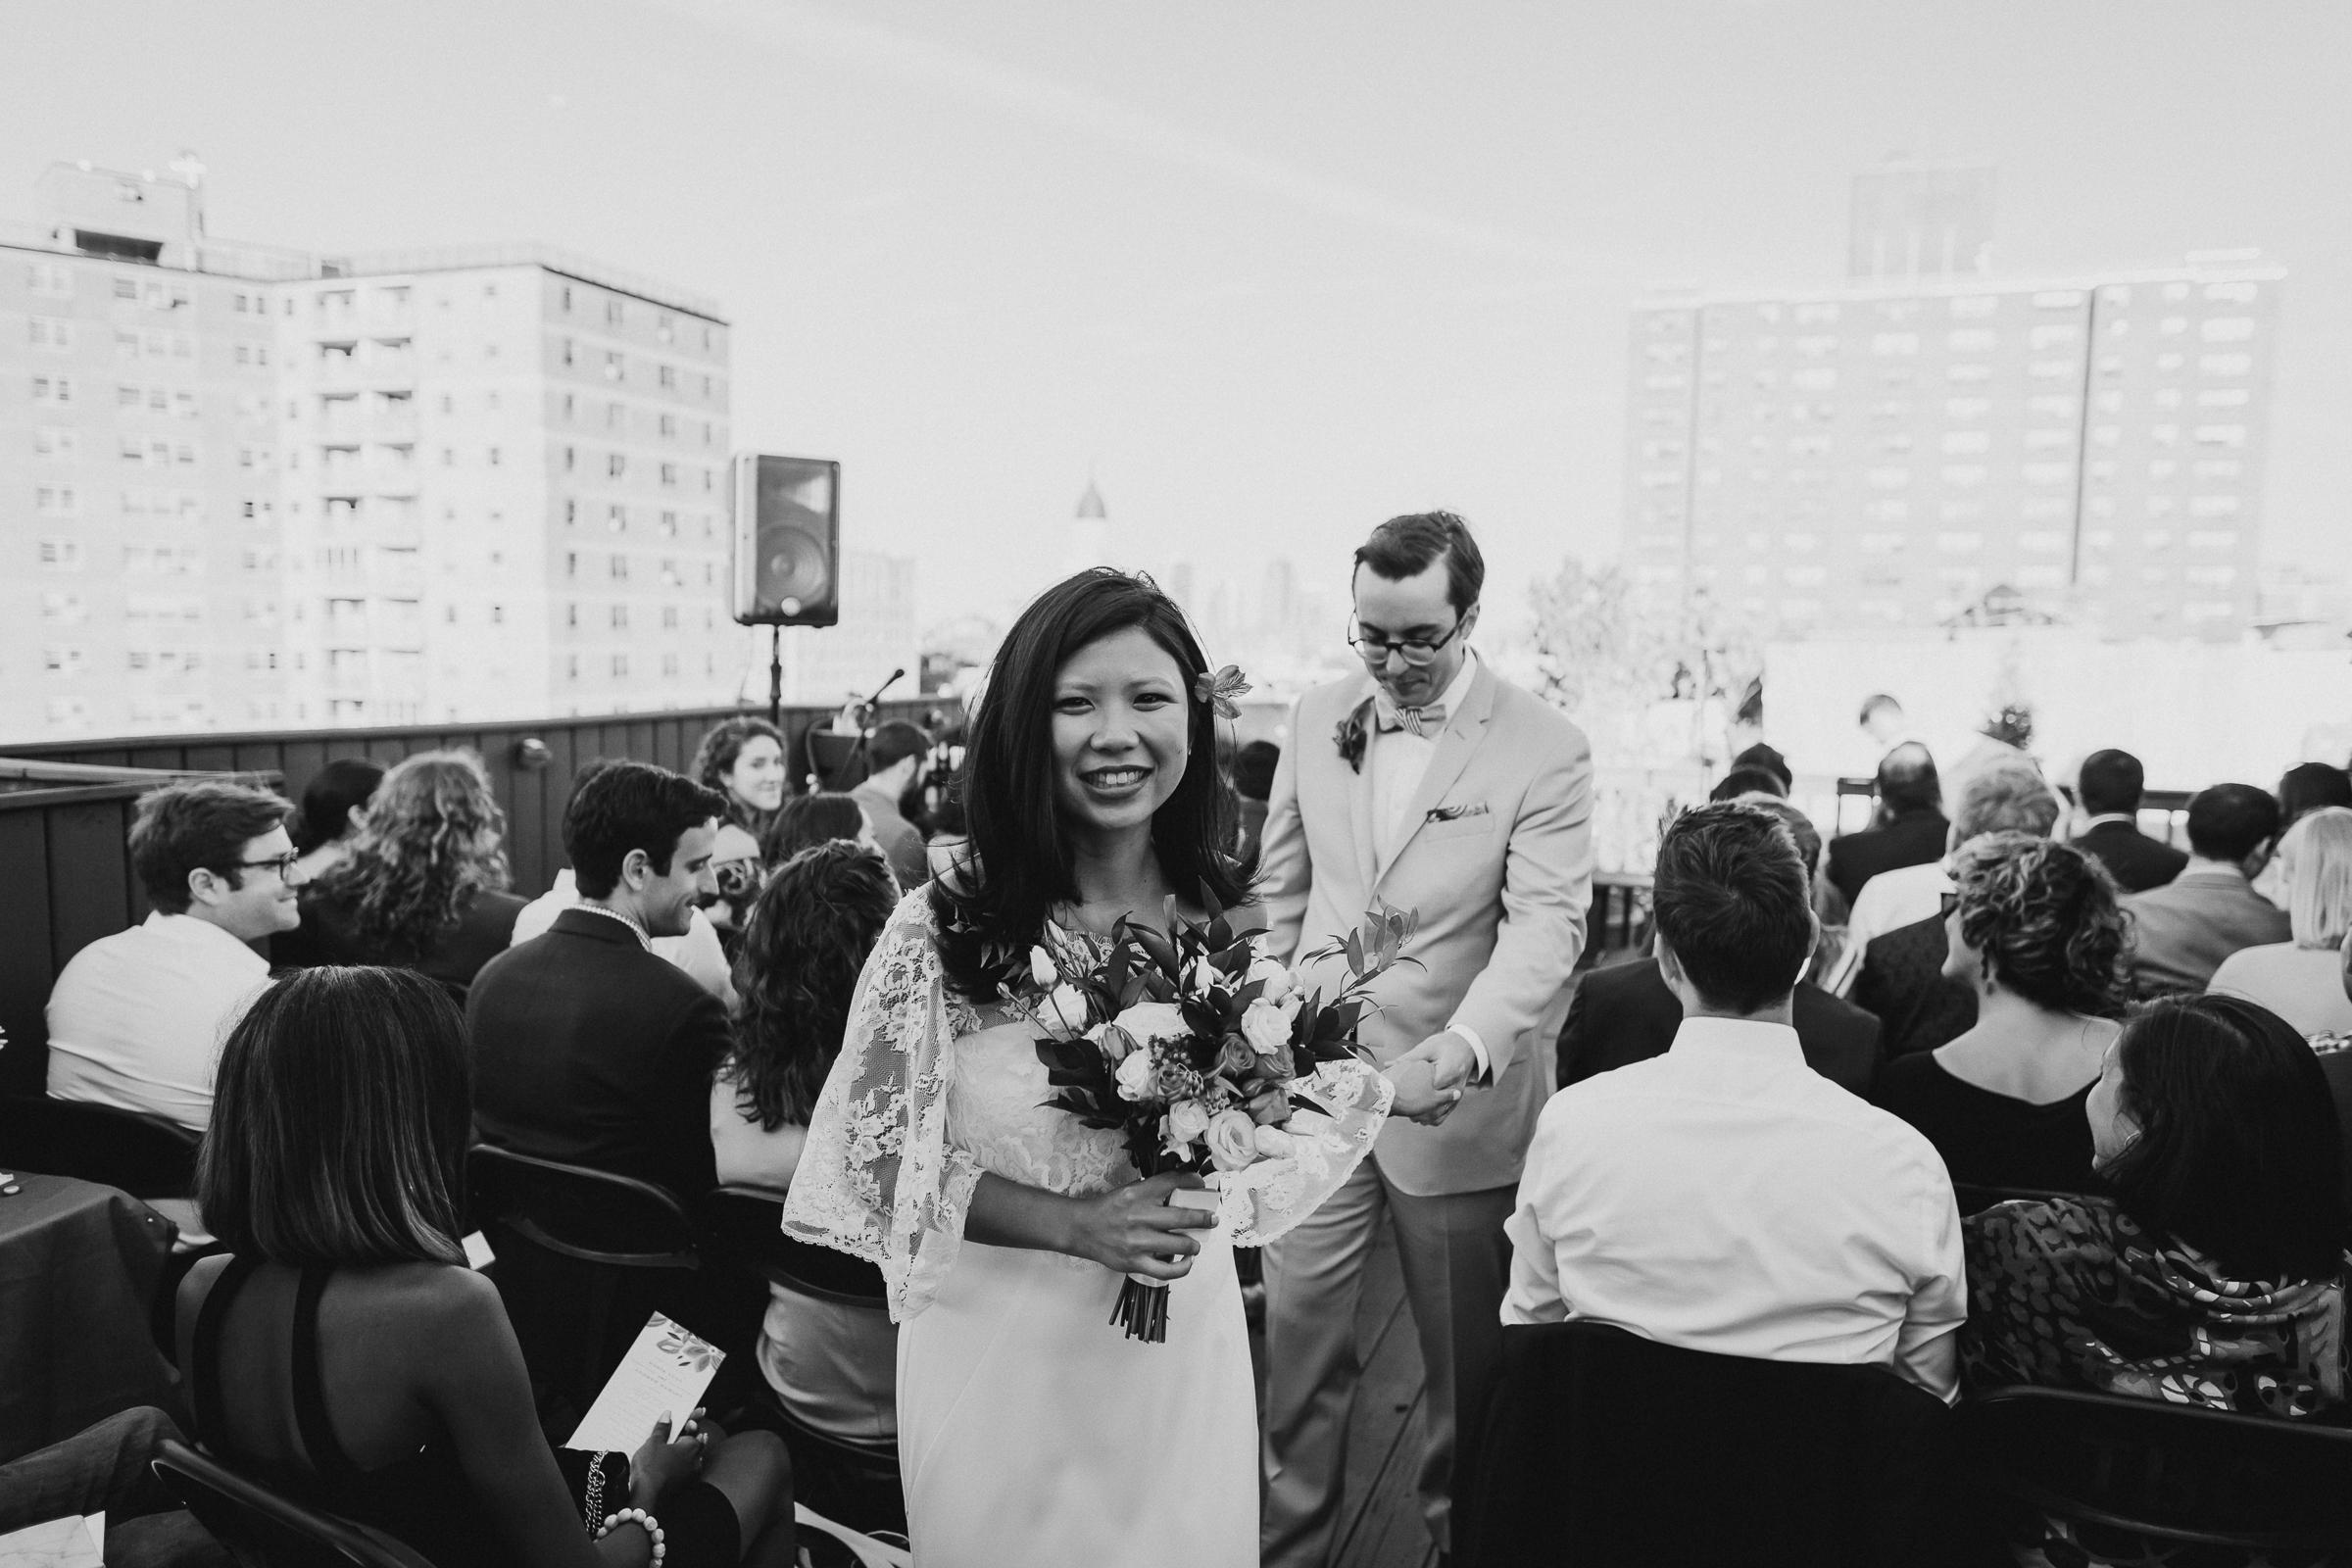 The-Bhakti-Center-Yoga-NYC-Rooftop-Documentary-Wedding-Photographer-40.jpg